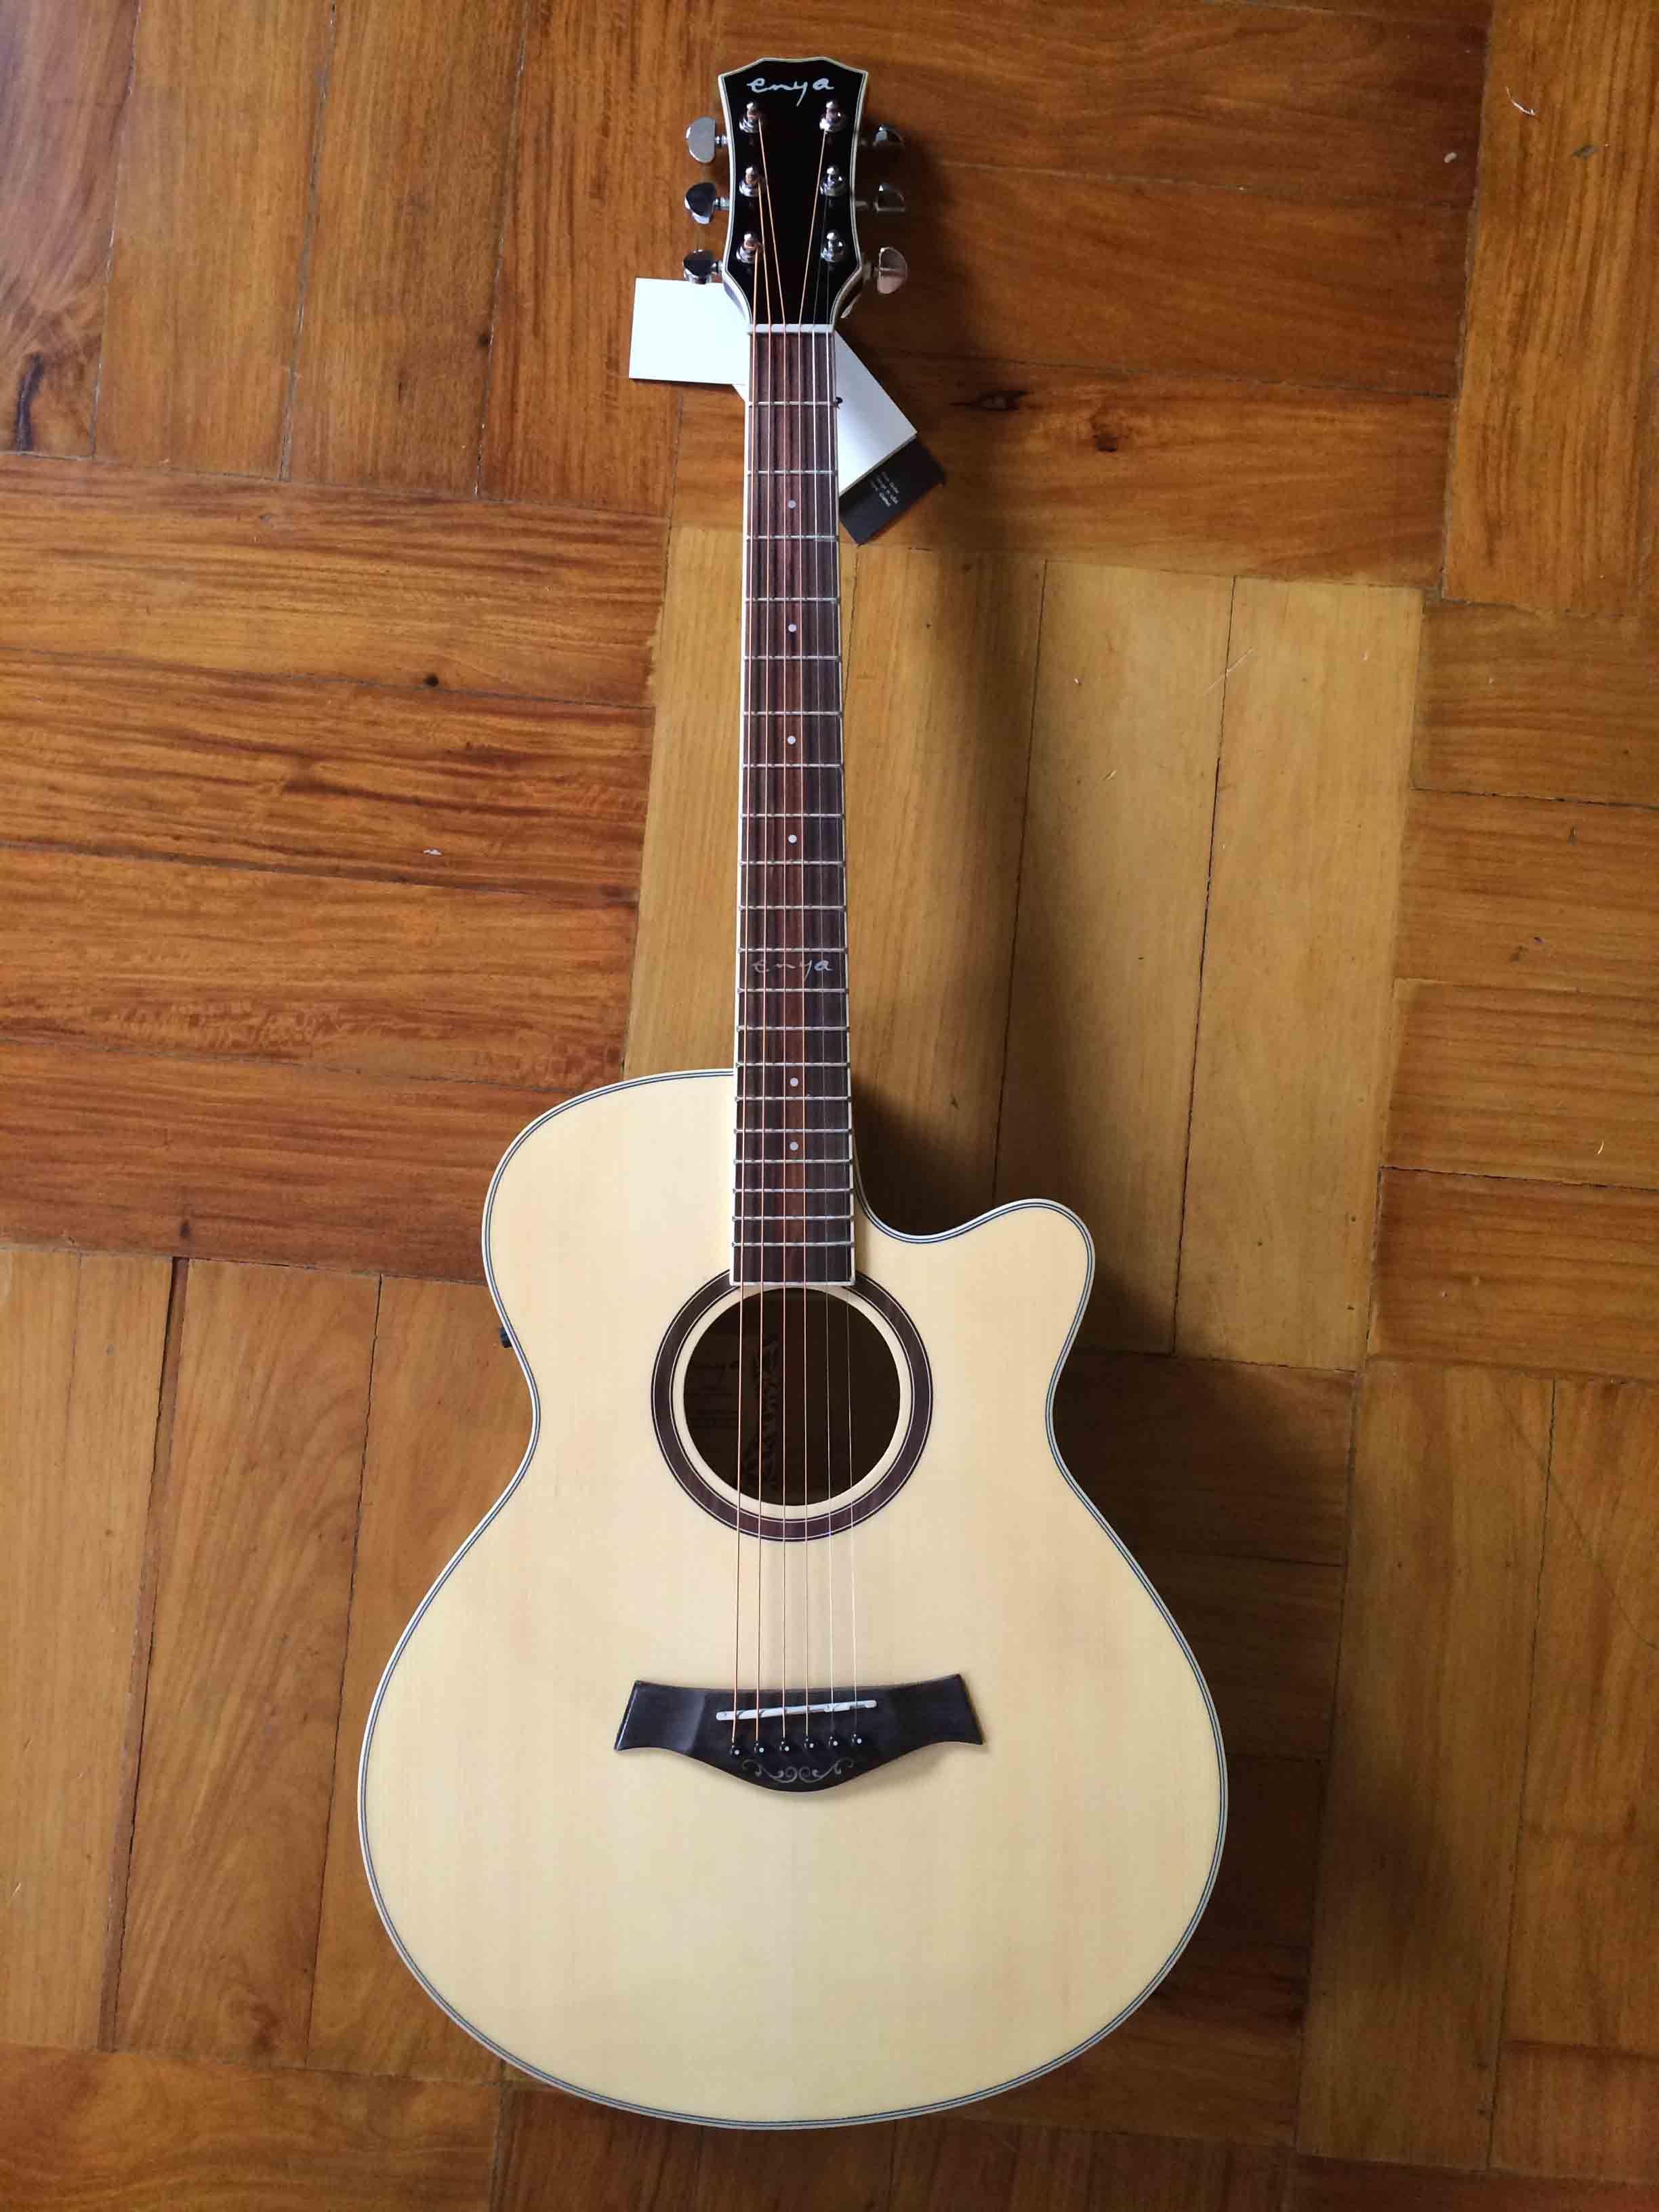 Enya Ef10 Grand Concert Guitar This Is The Enya Ef 10 A Simple Grand Concert Shaped Acoustic Guitar Taylor Guitars Describes The Grand Conce Tudo Sobre Musica